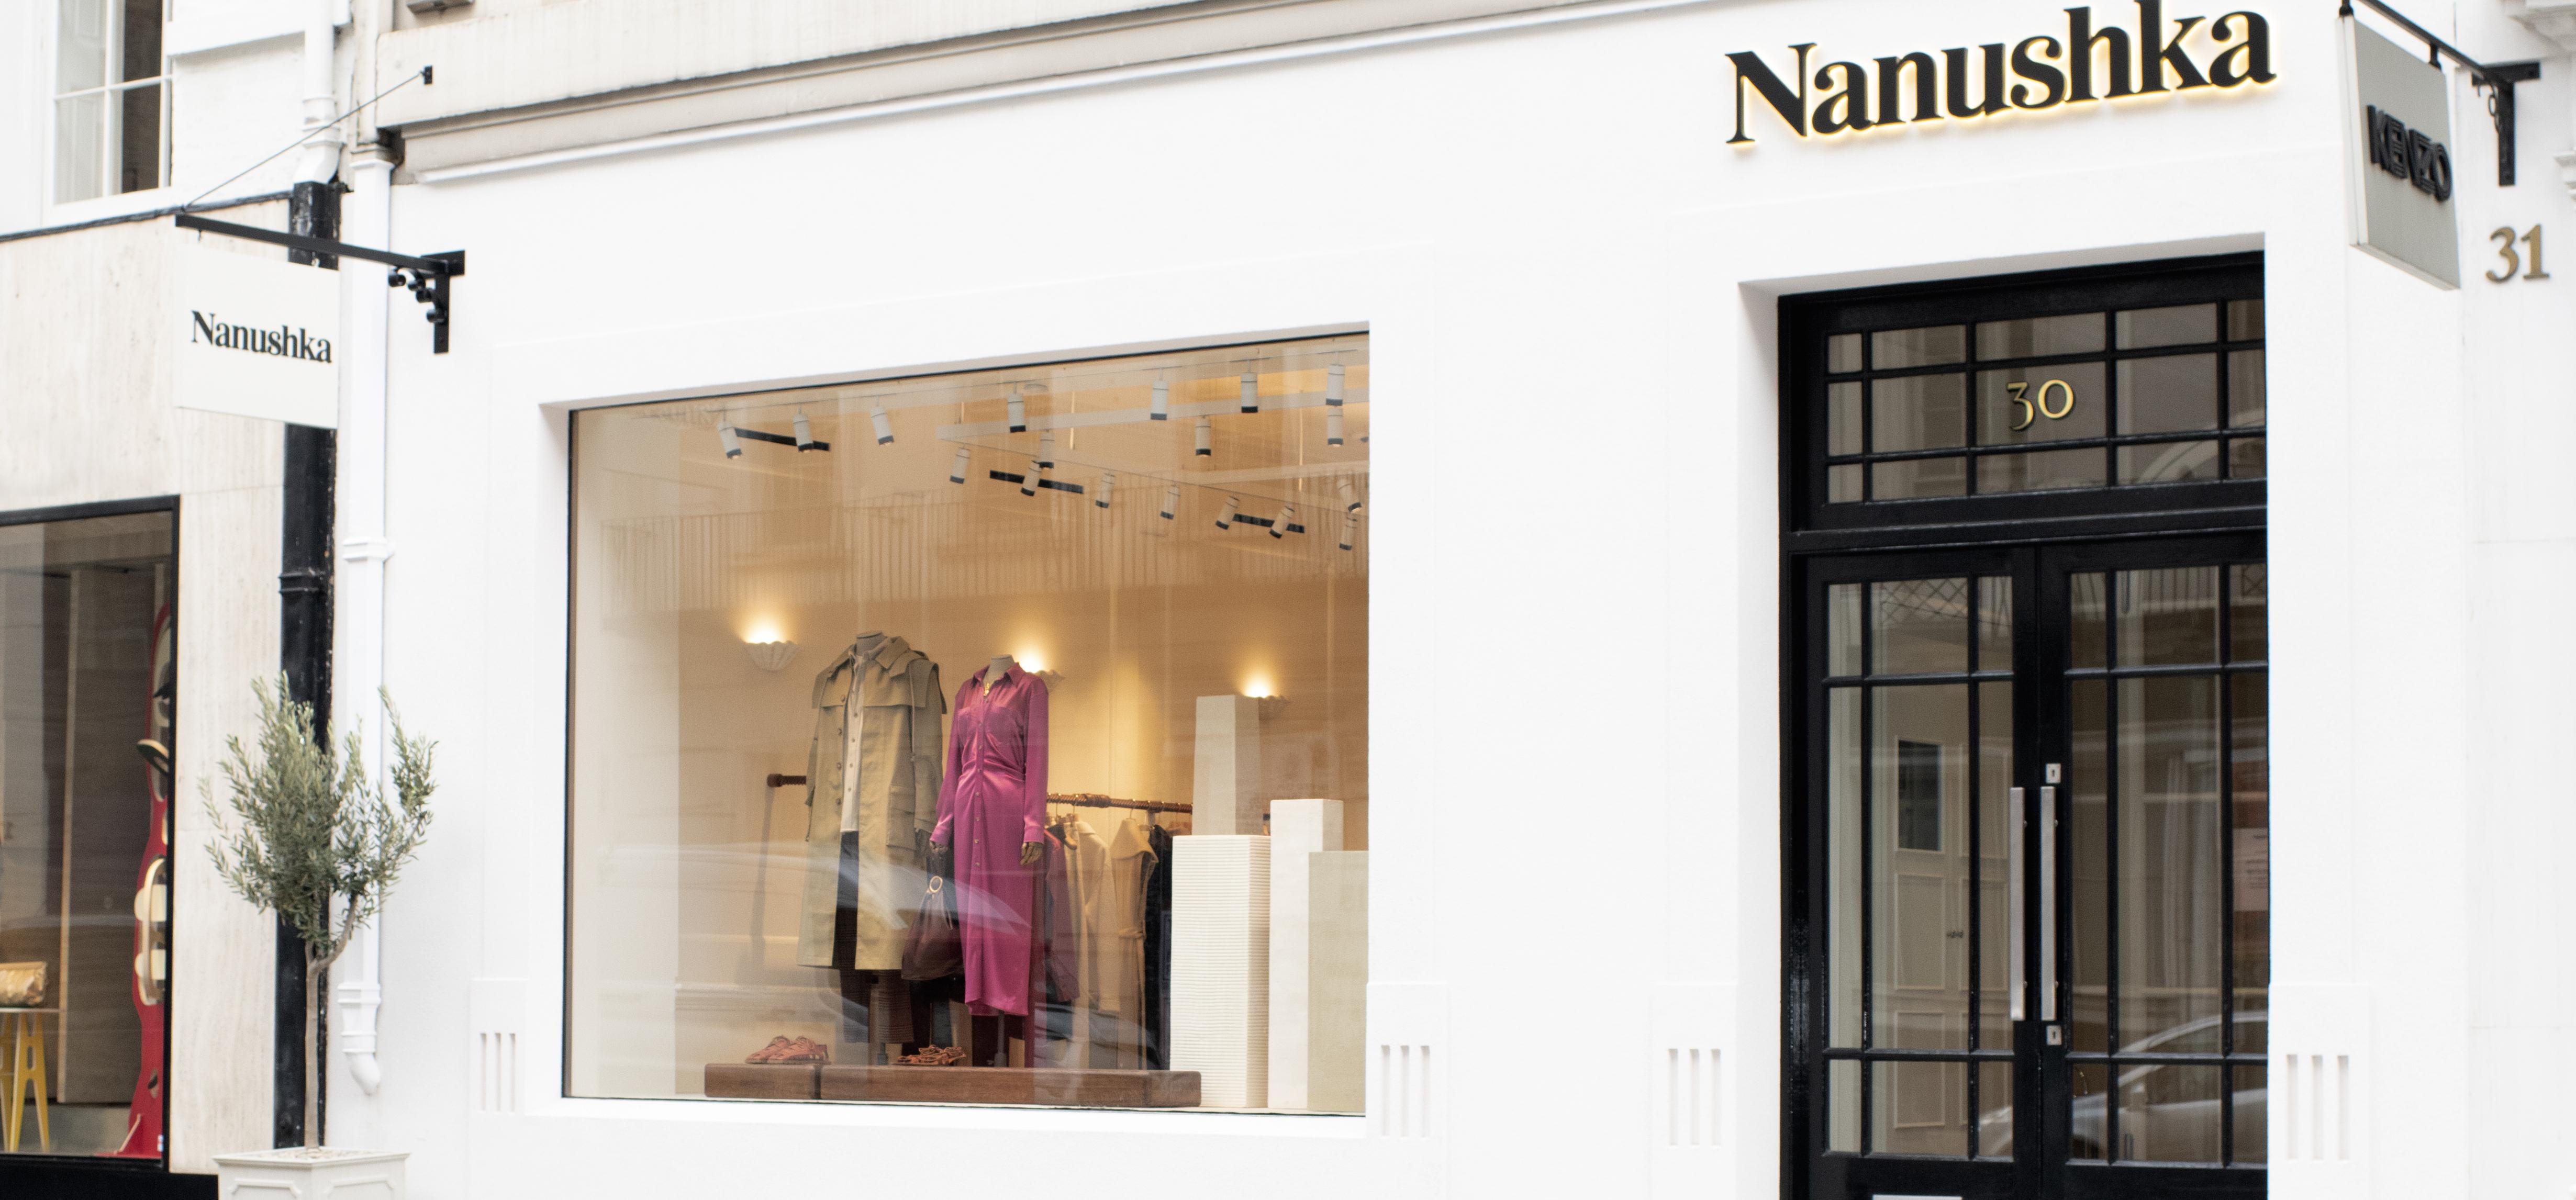 Nanushka store, Mayfair, London